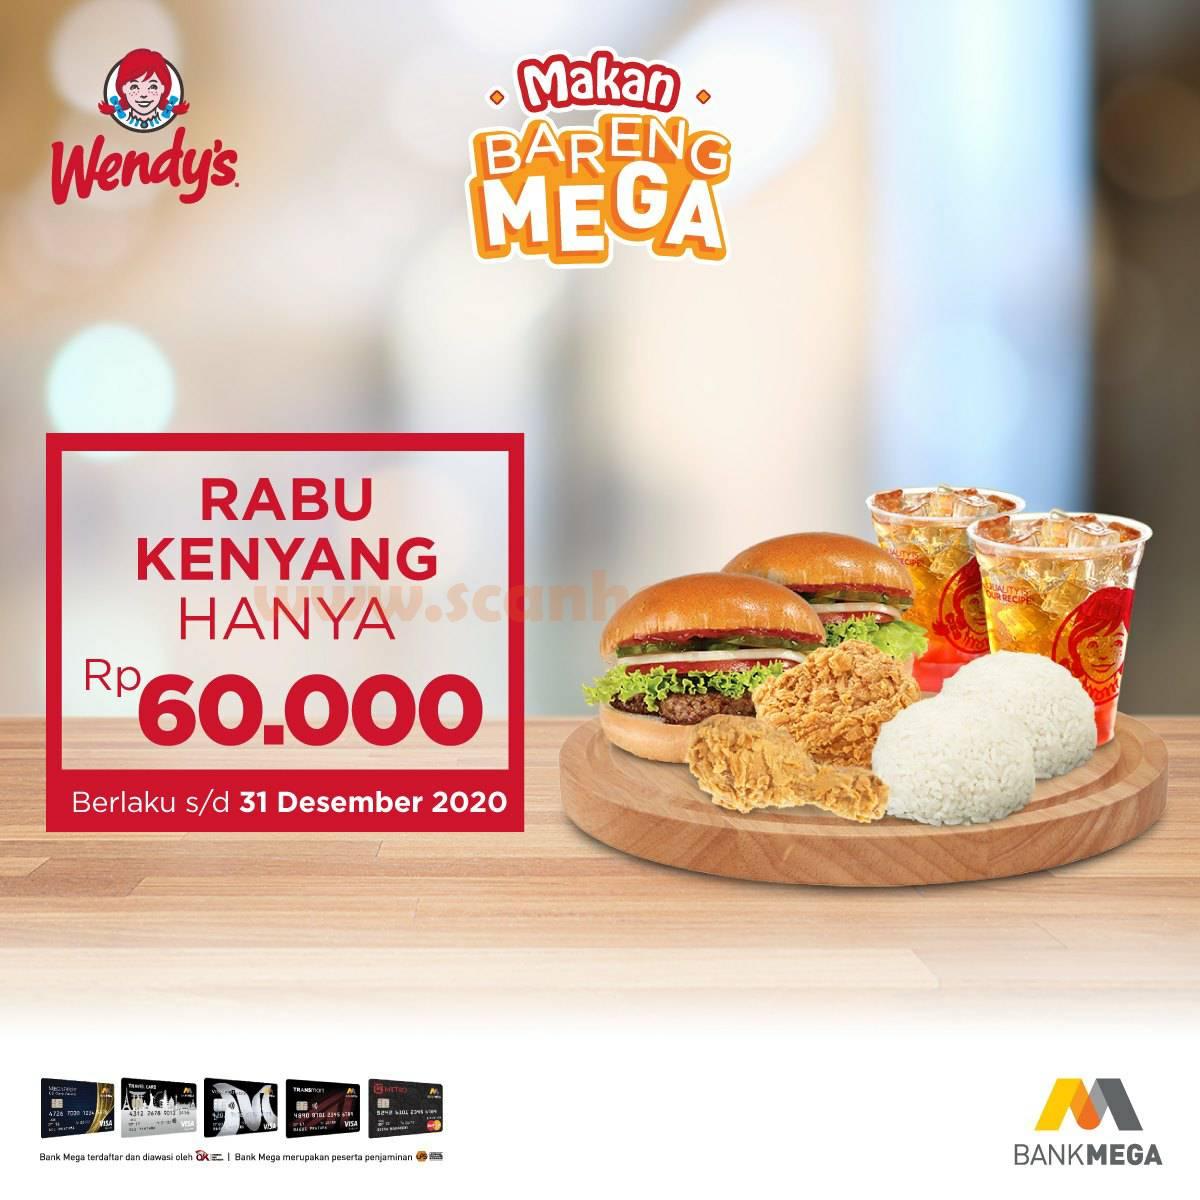 Promo Wendy S Rabu Kenyang Hanya Rp 60 000 Bayar Dengan Kartu Kredit Bank Mega Scanharga